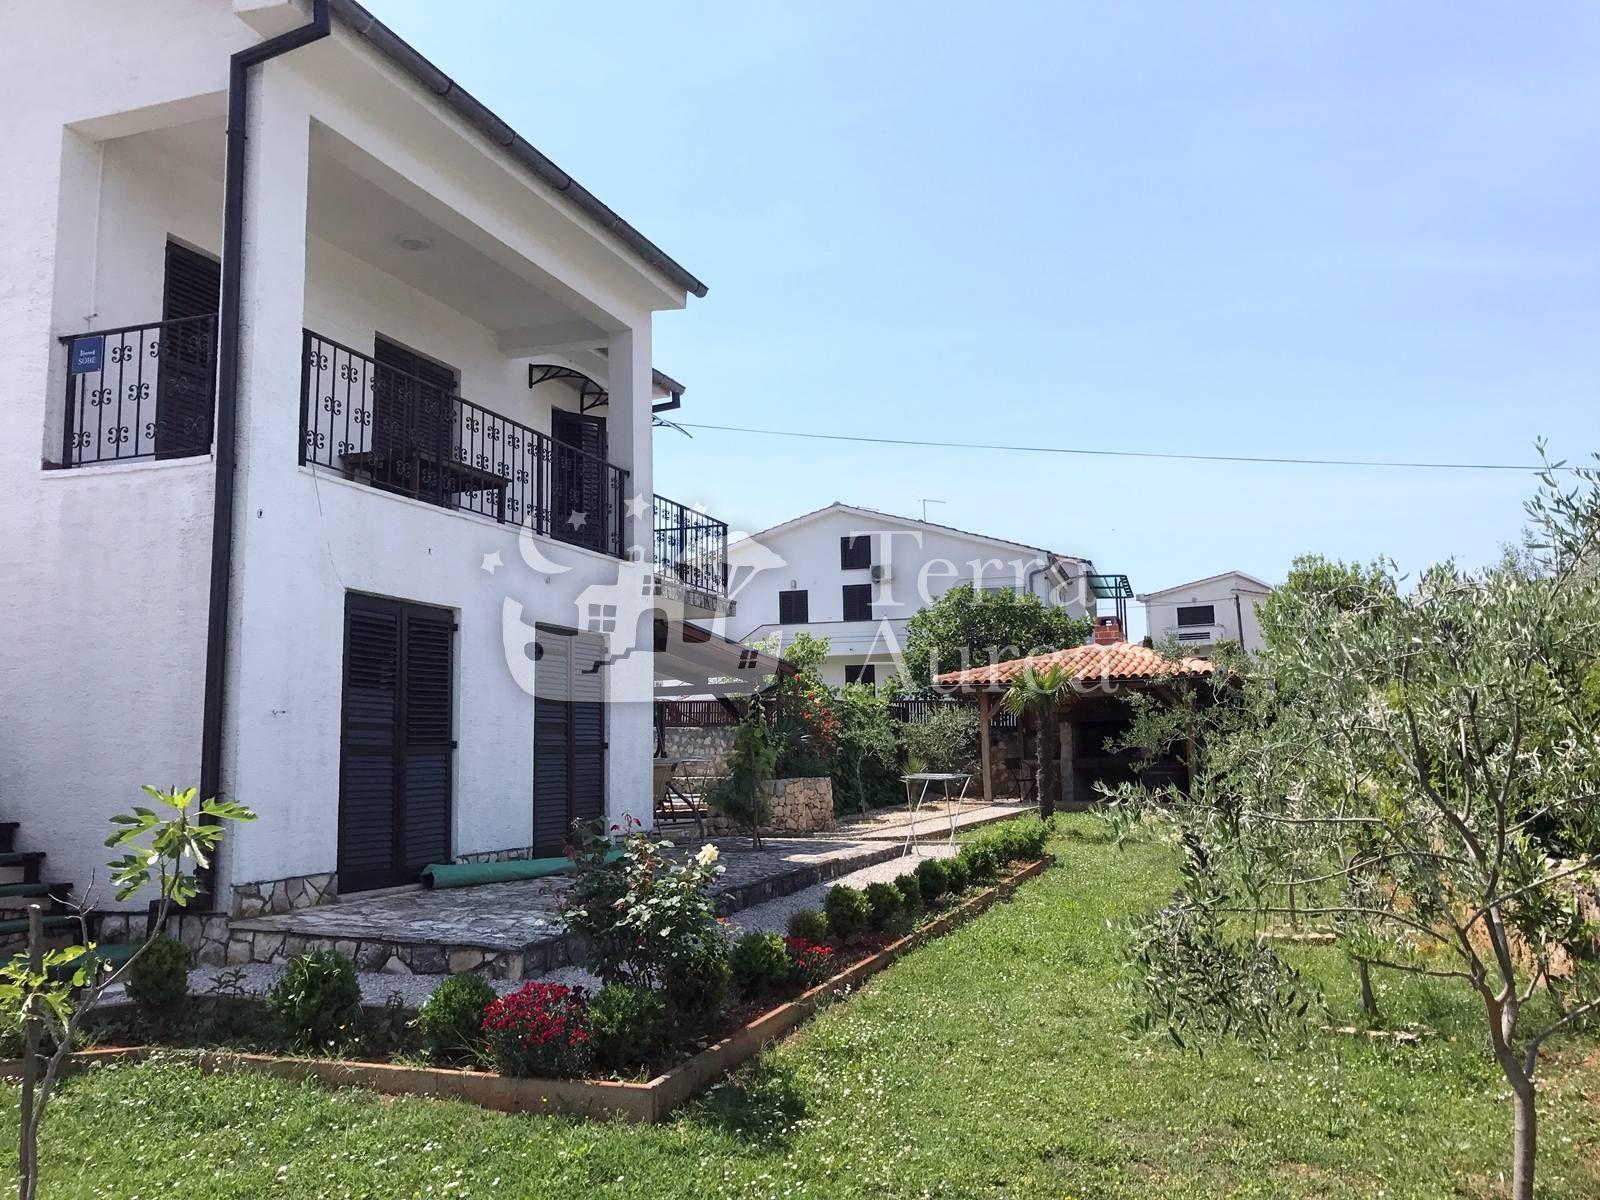 House Vantačići, Malinska Dubašnica, 200m2, House | Aurea Real Estate Krk  Island | Apartments, Houses, Land, Villas